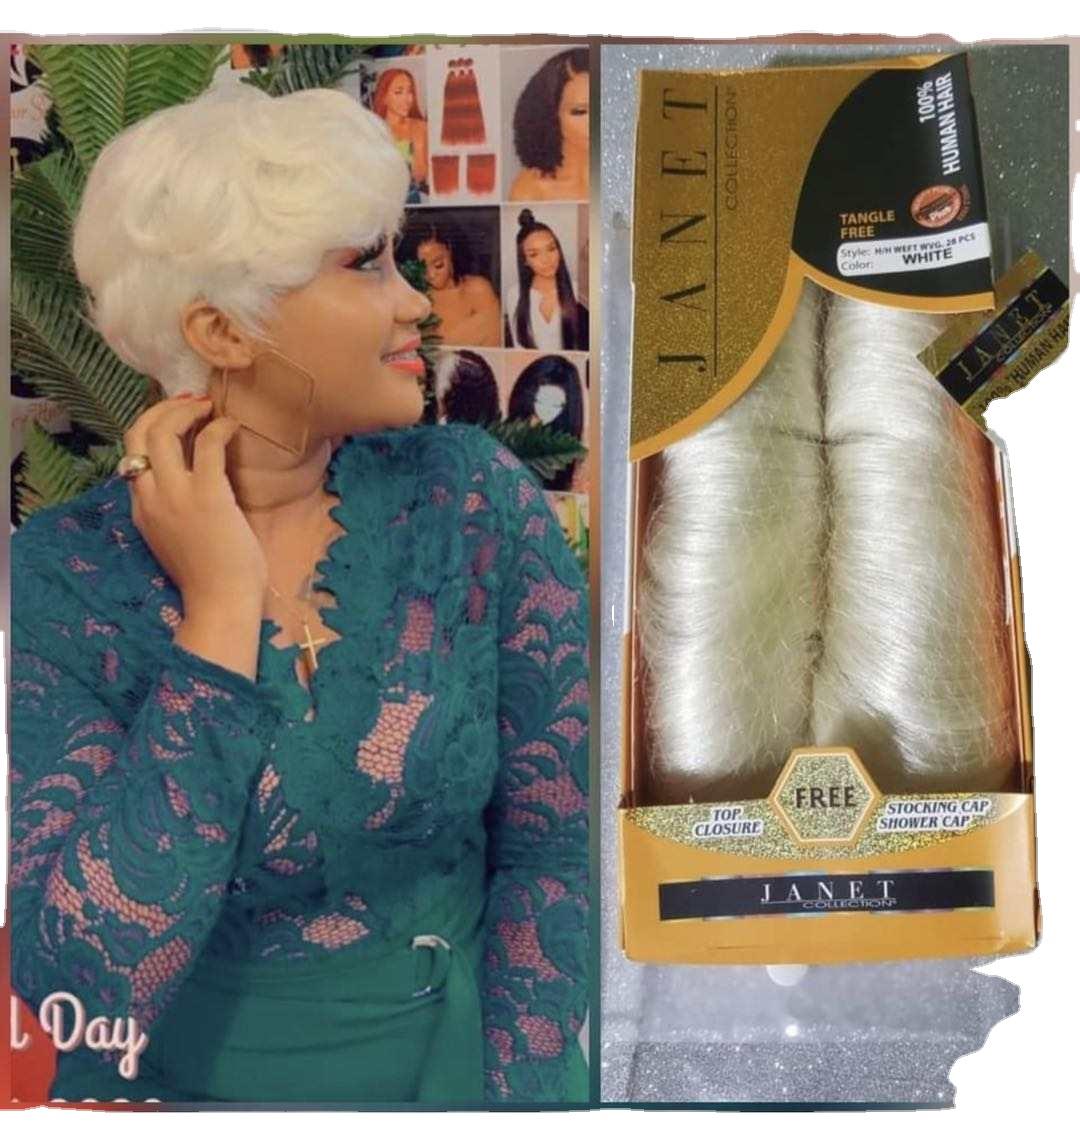 Most Popular Bump Femi Hair Extension 28 PCS Femi Hair Short Bump Janet Hair Extension